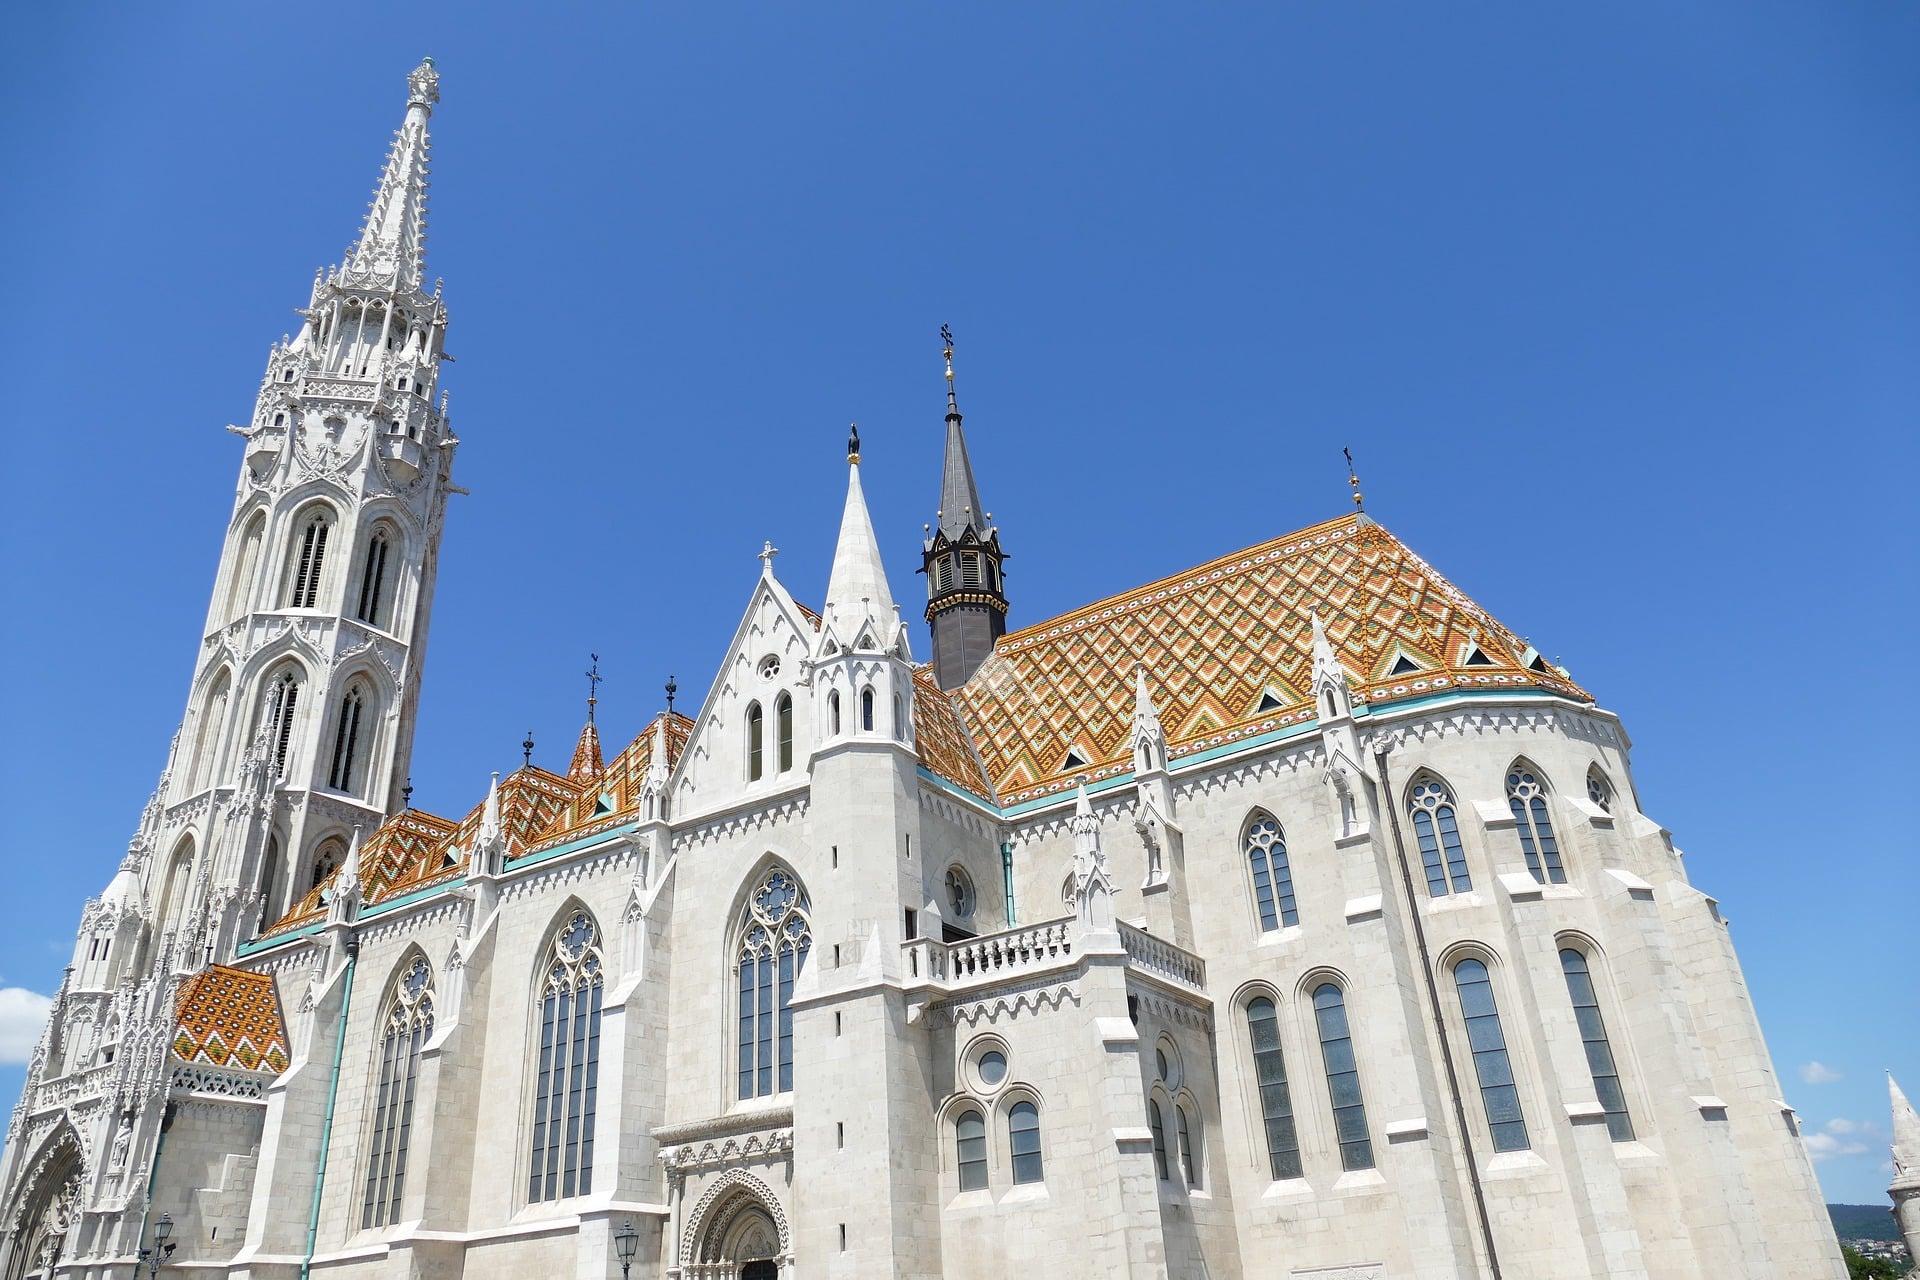 matthias church budapest must-see